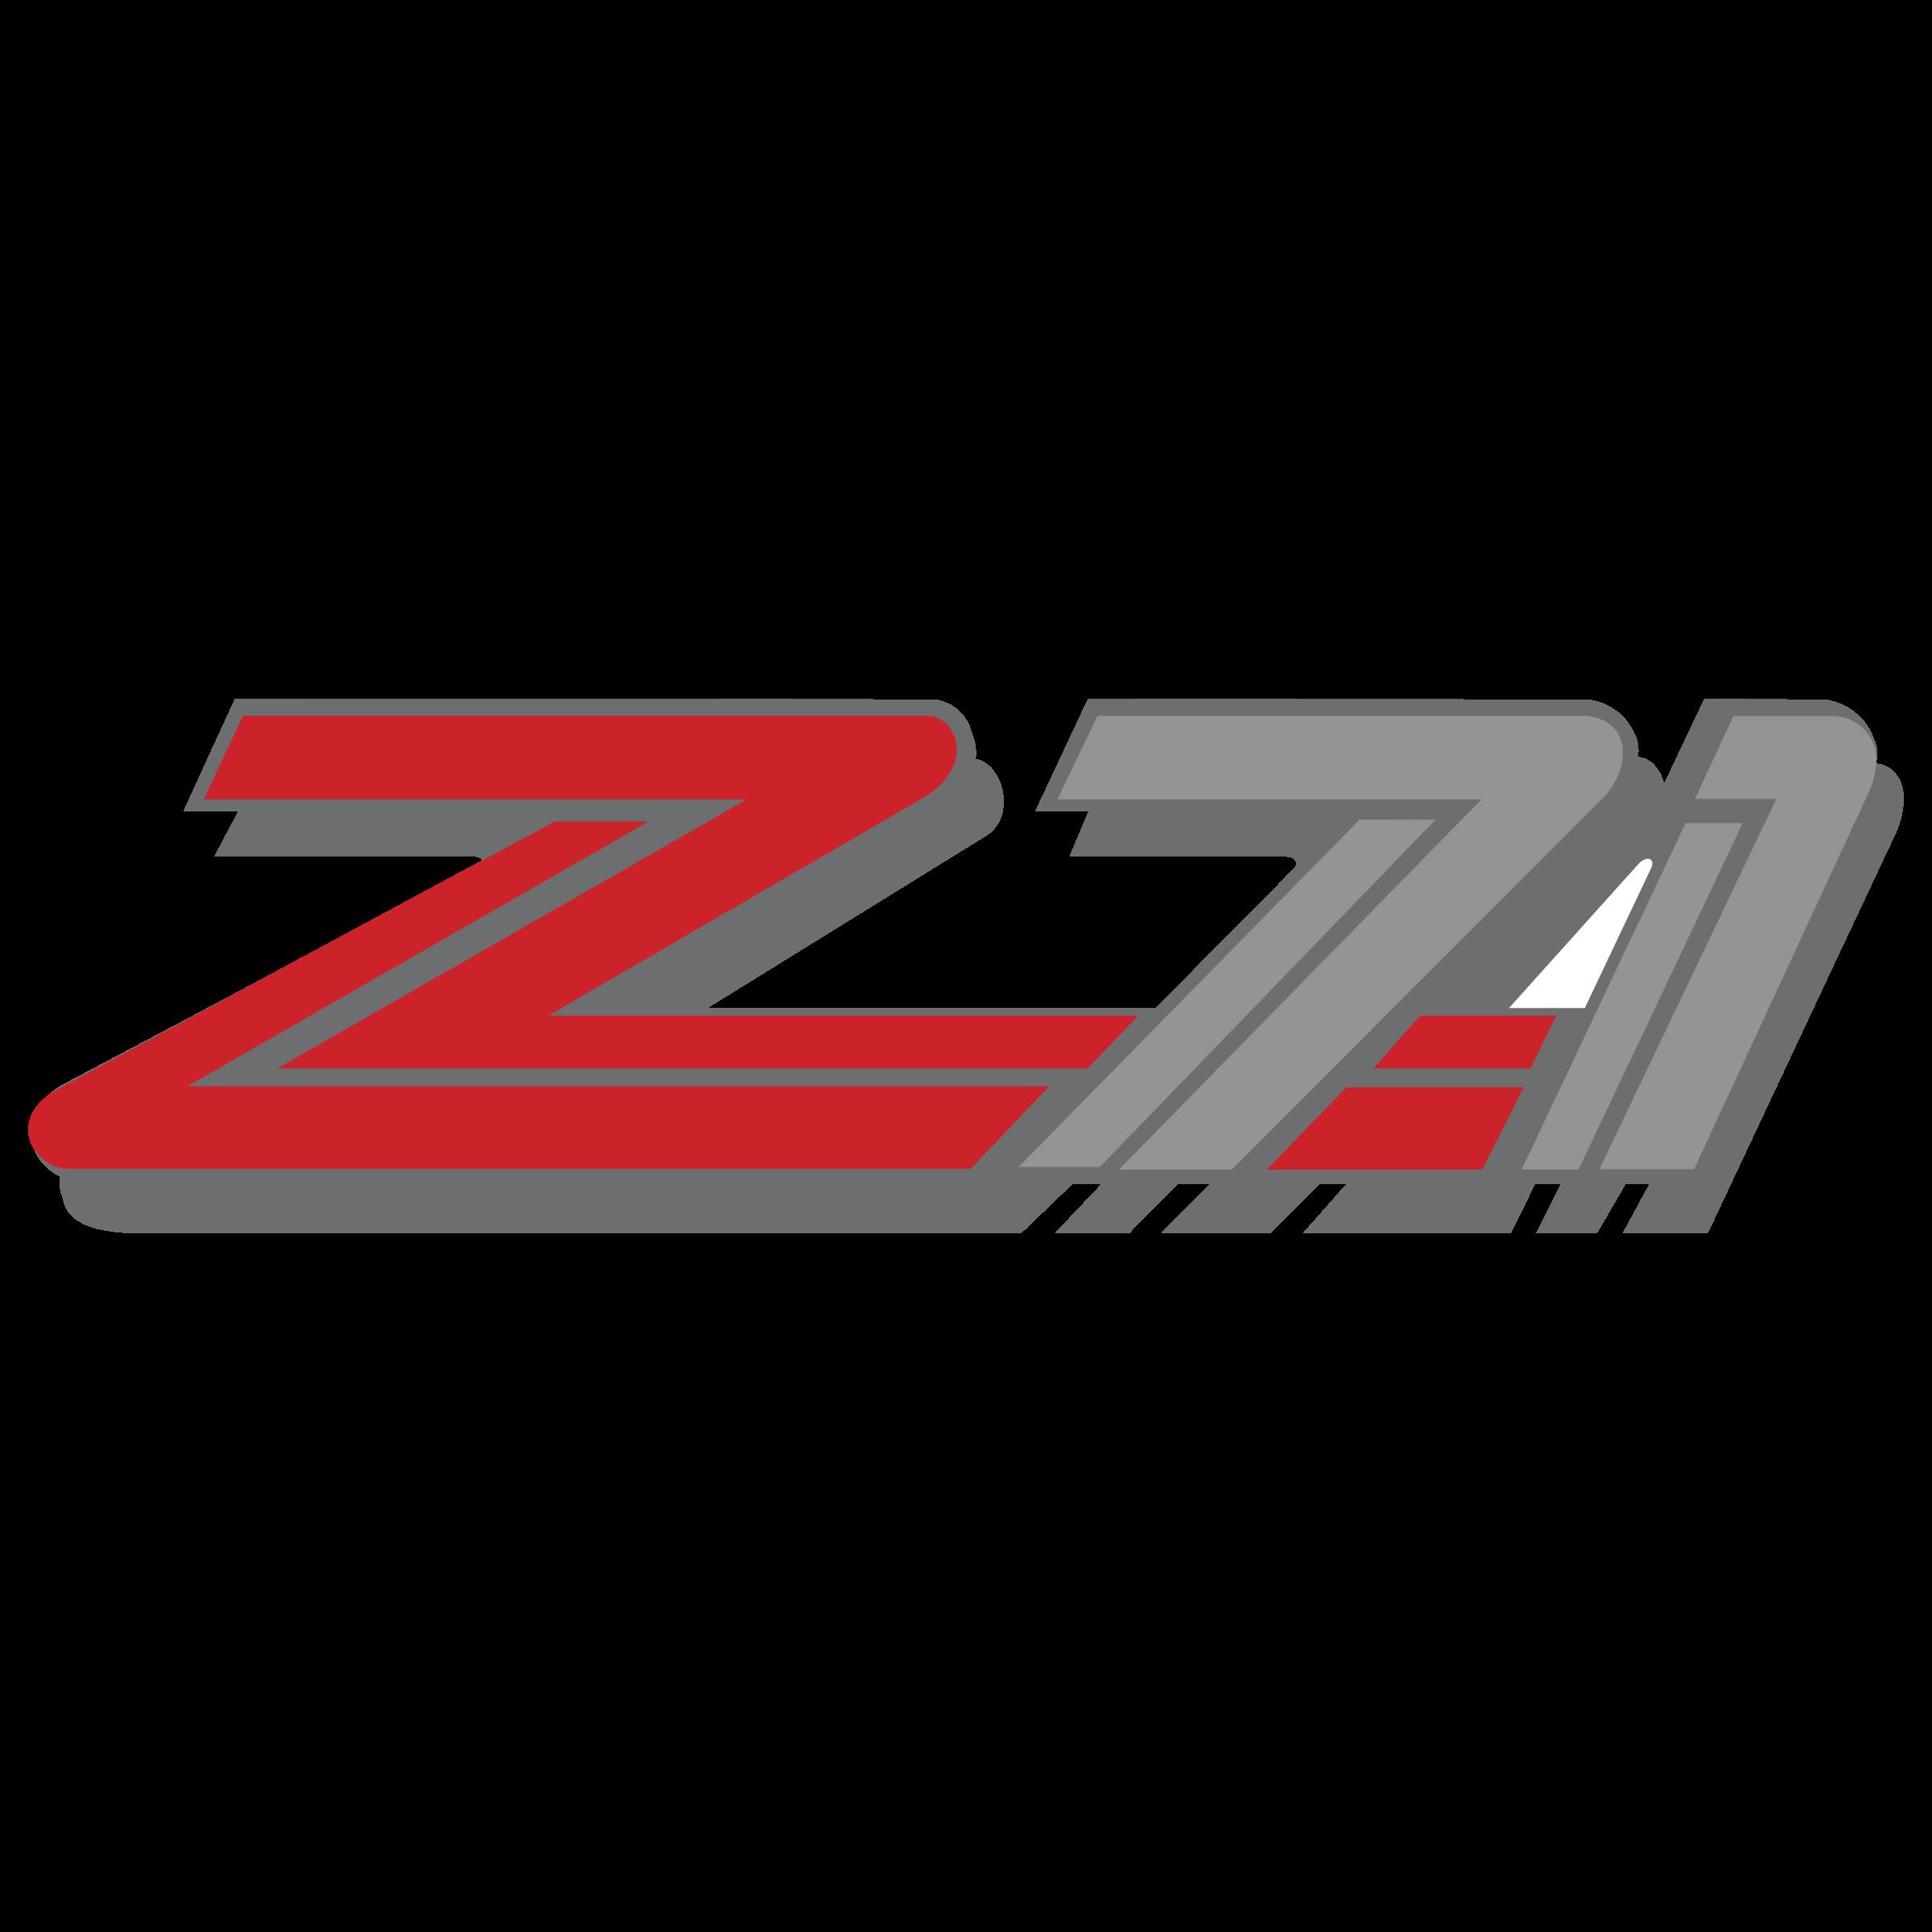 z71 logo png transparent svg vector freebie supply rh freebiesupply com z71 logo wallpaper z71 logo floor mats